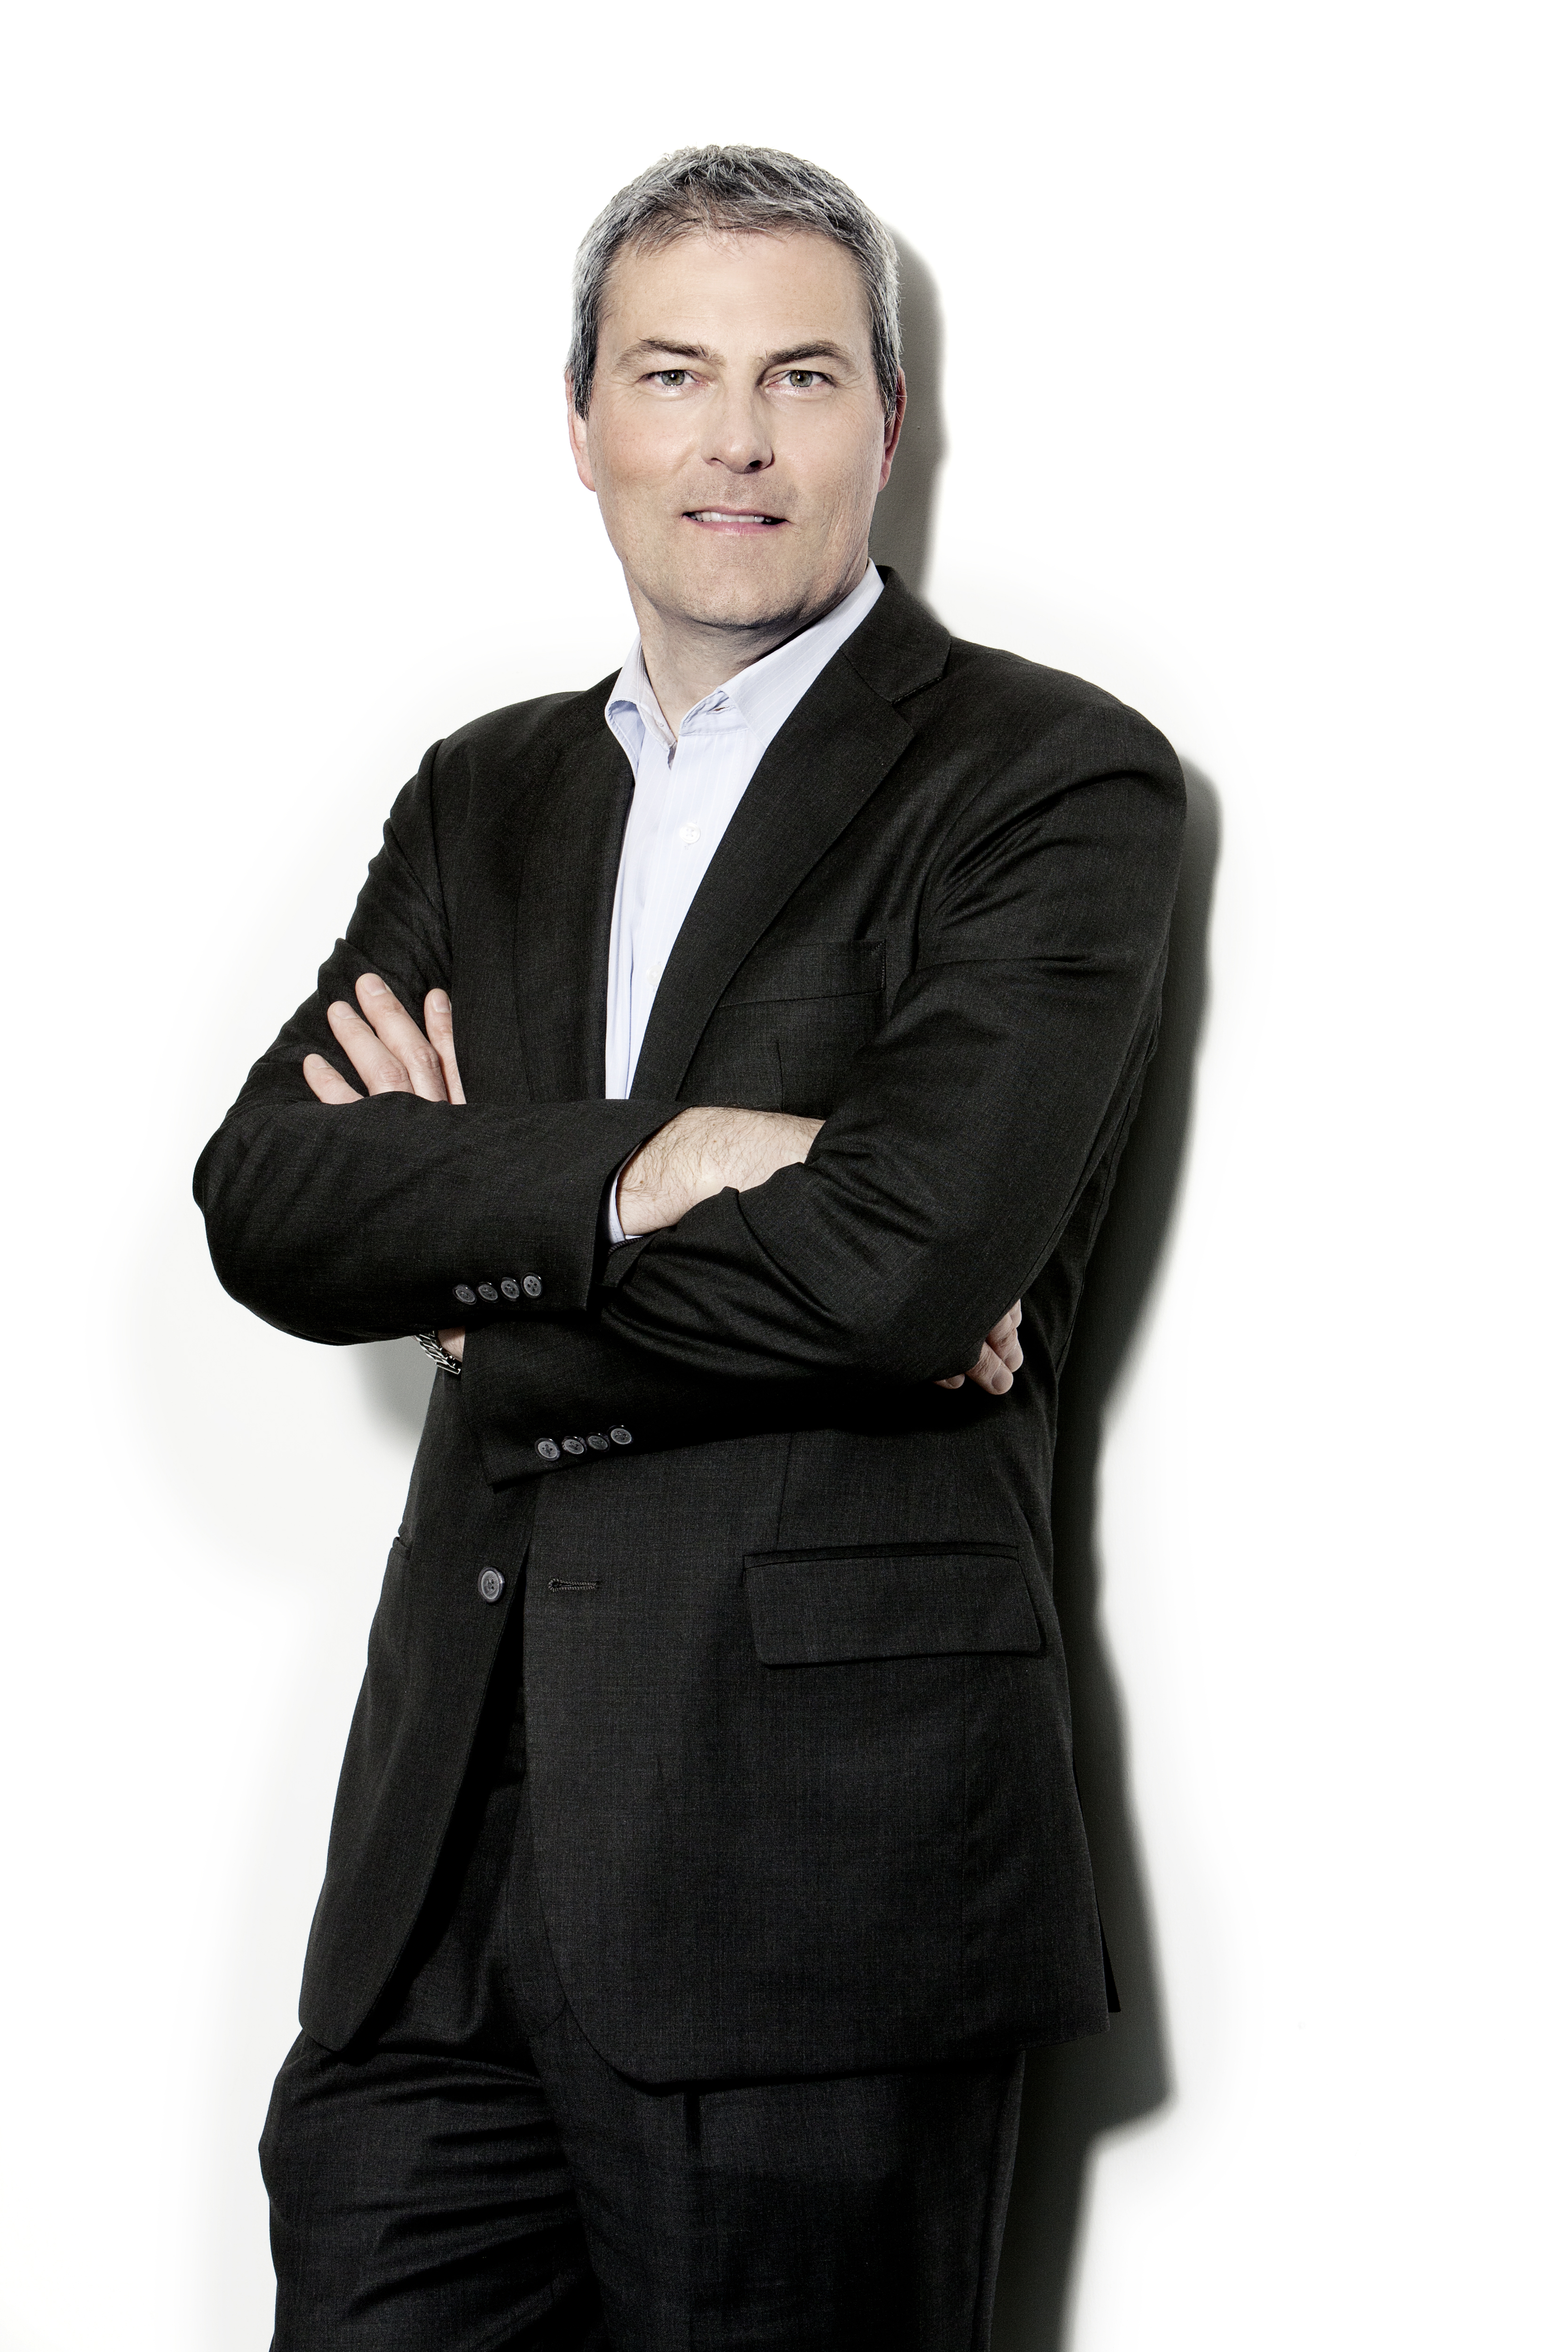 Peter Dekkers